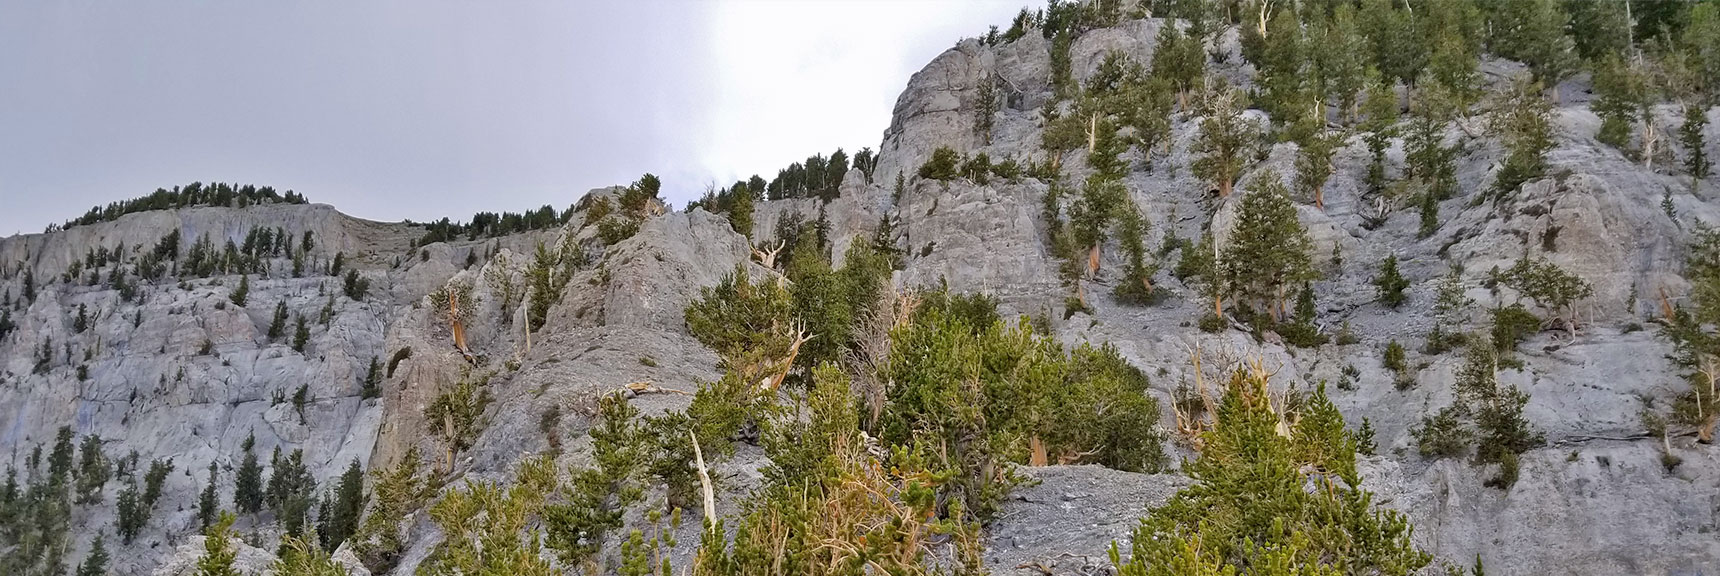 Mummy Mountain Eastern Cliff and Ridge   Mummy Mountain NNE, Mt. Charleston Wilderness, Nevada, Slide 022